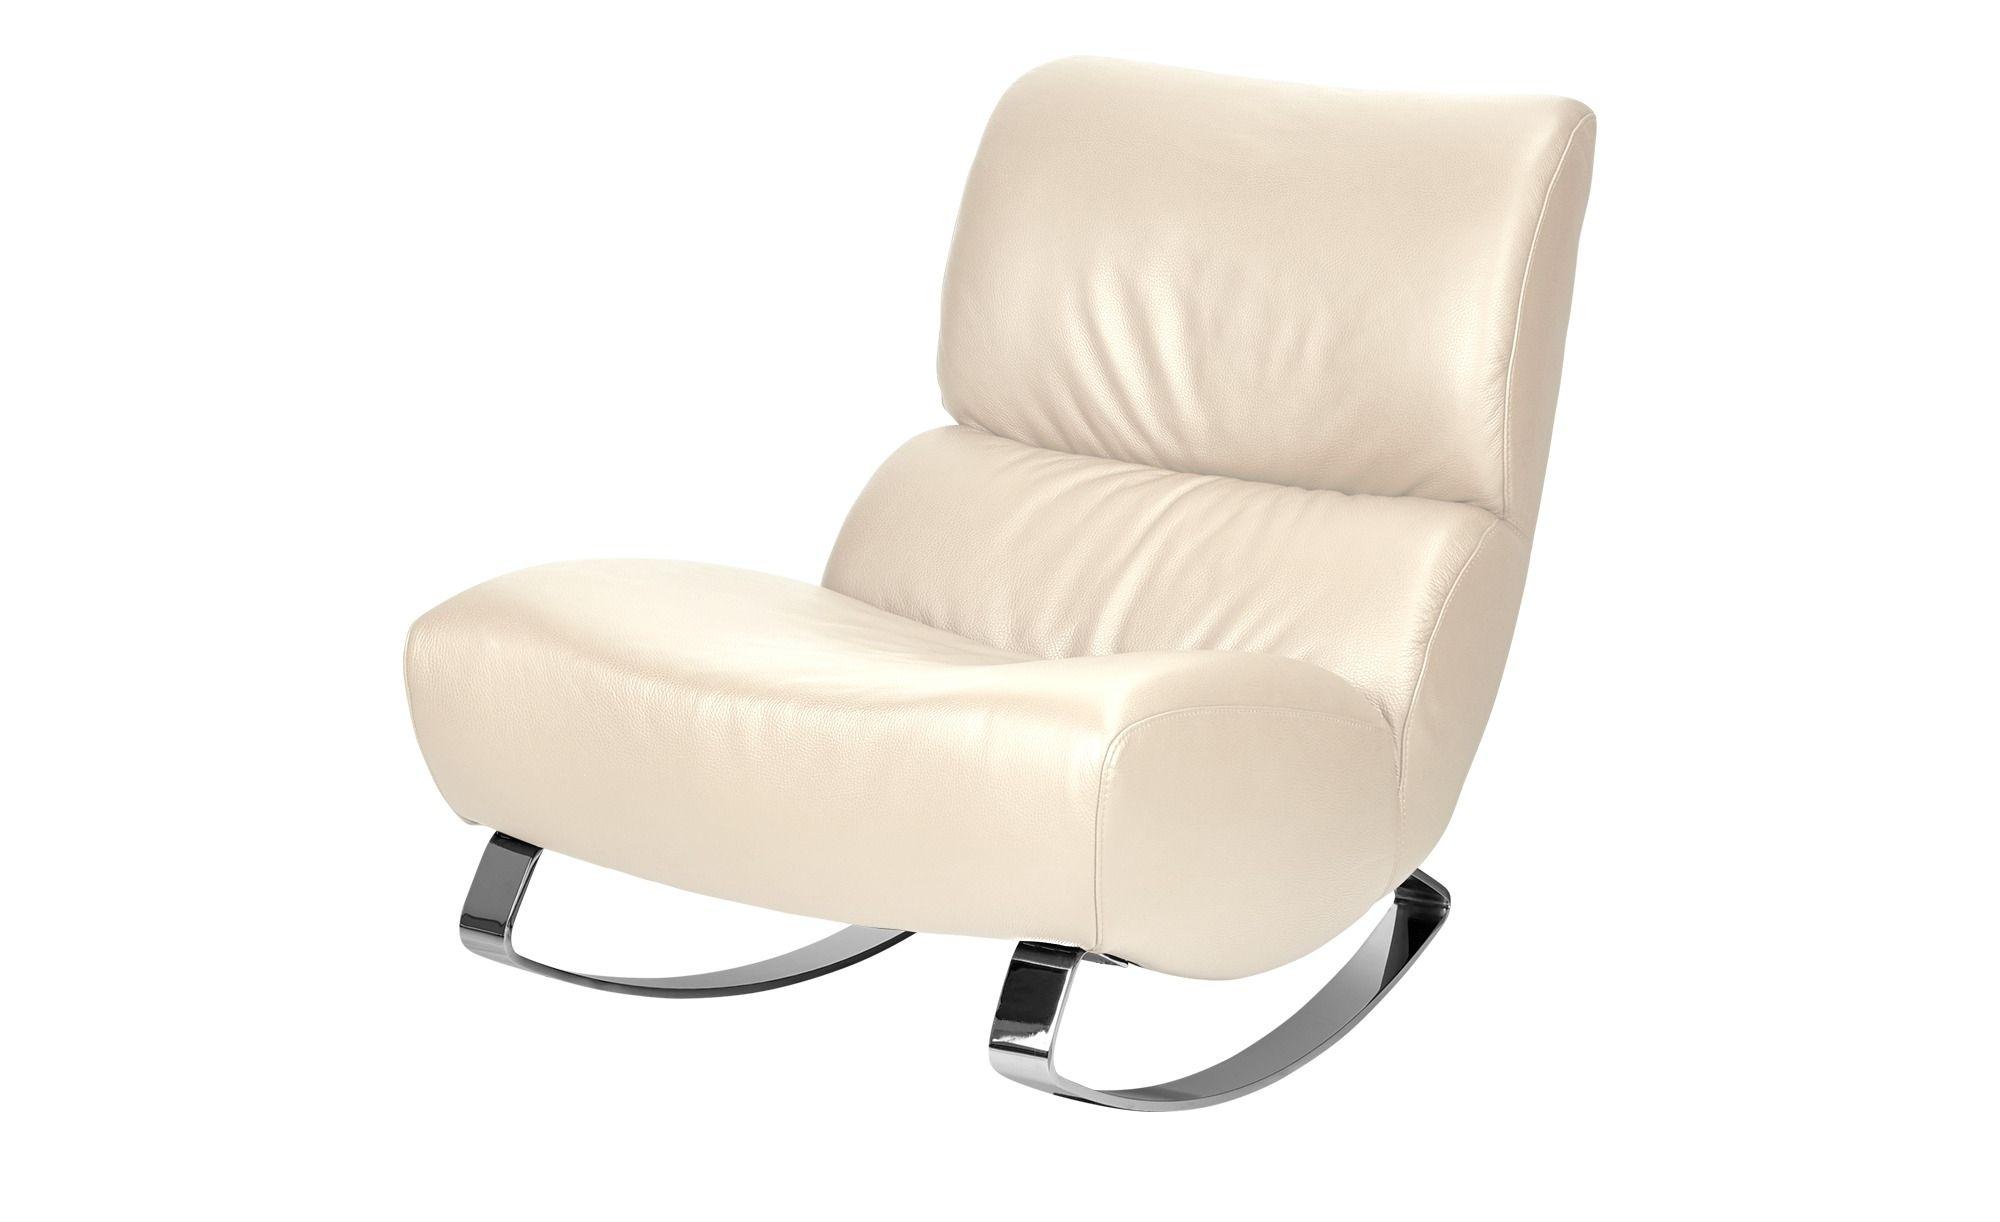 Pop Design Sessel Braun Stoff Citole Relaxsessel Leder Pop Design Und Fernsehsessel Leder